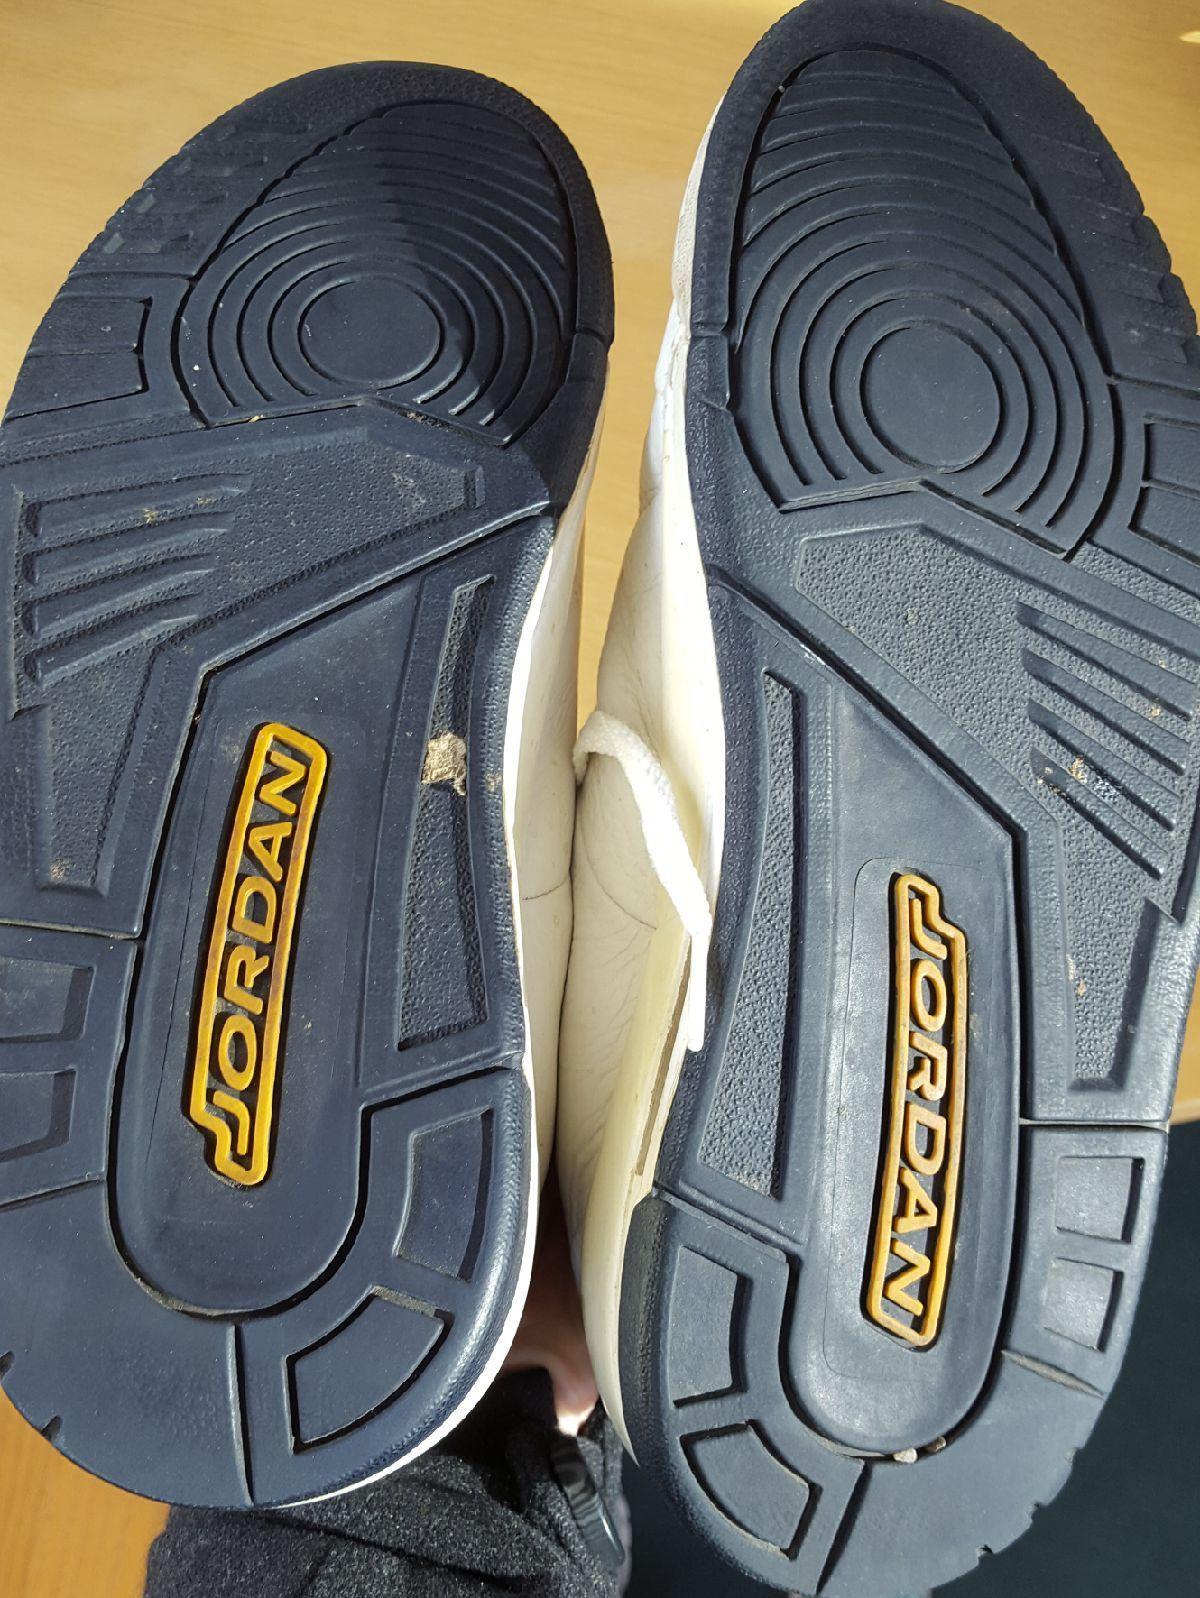 online store e8d6e a54cc 2006 Mens N ke Air Jordan 23 Classic White Leather Shoes Size 8.5 313480-